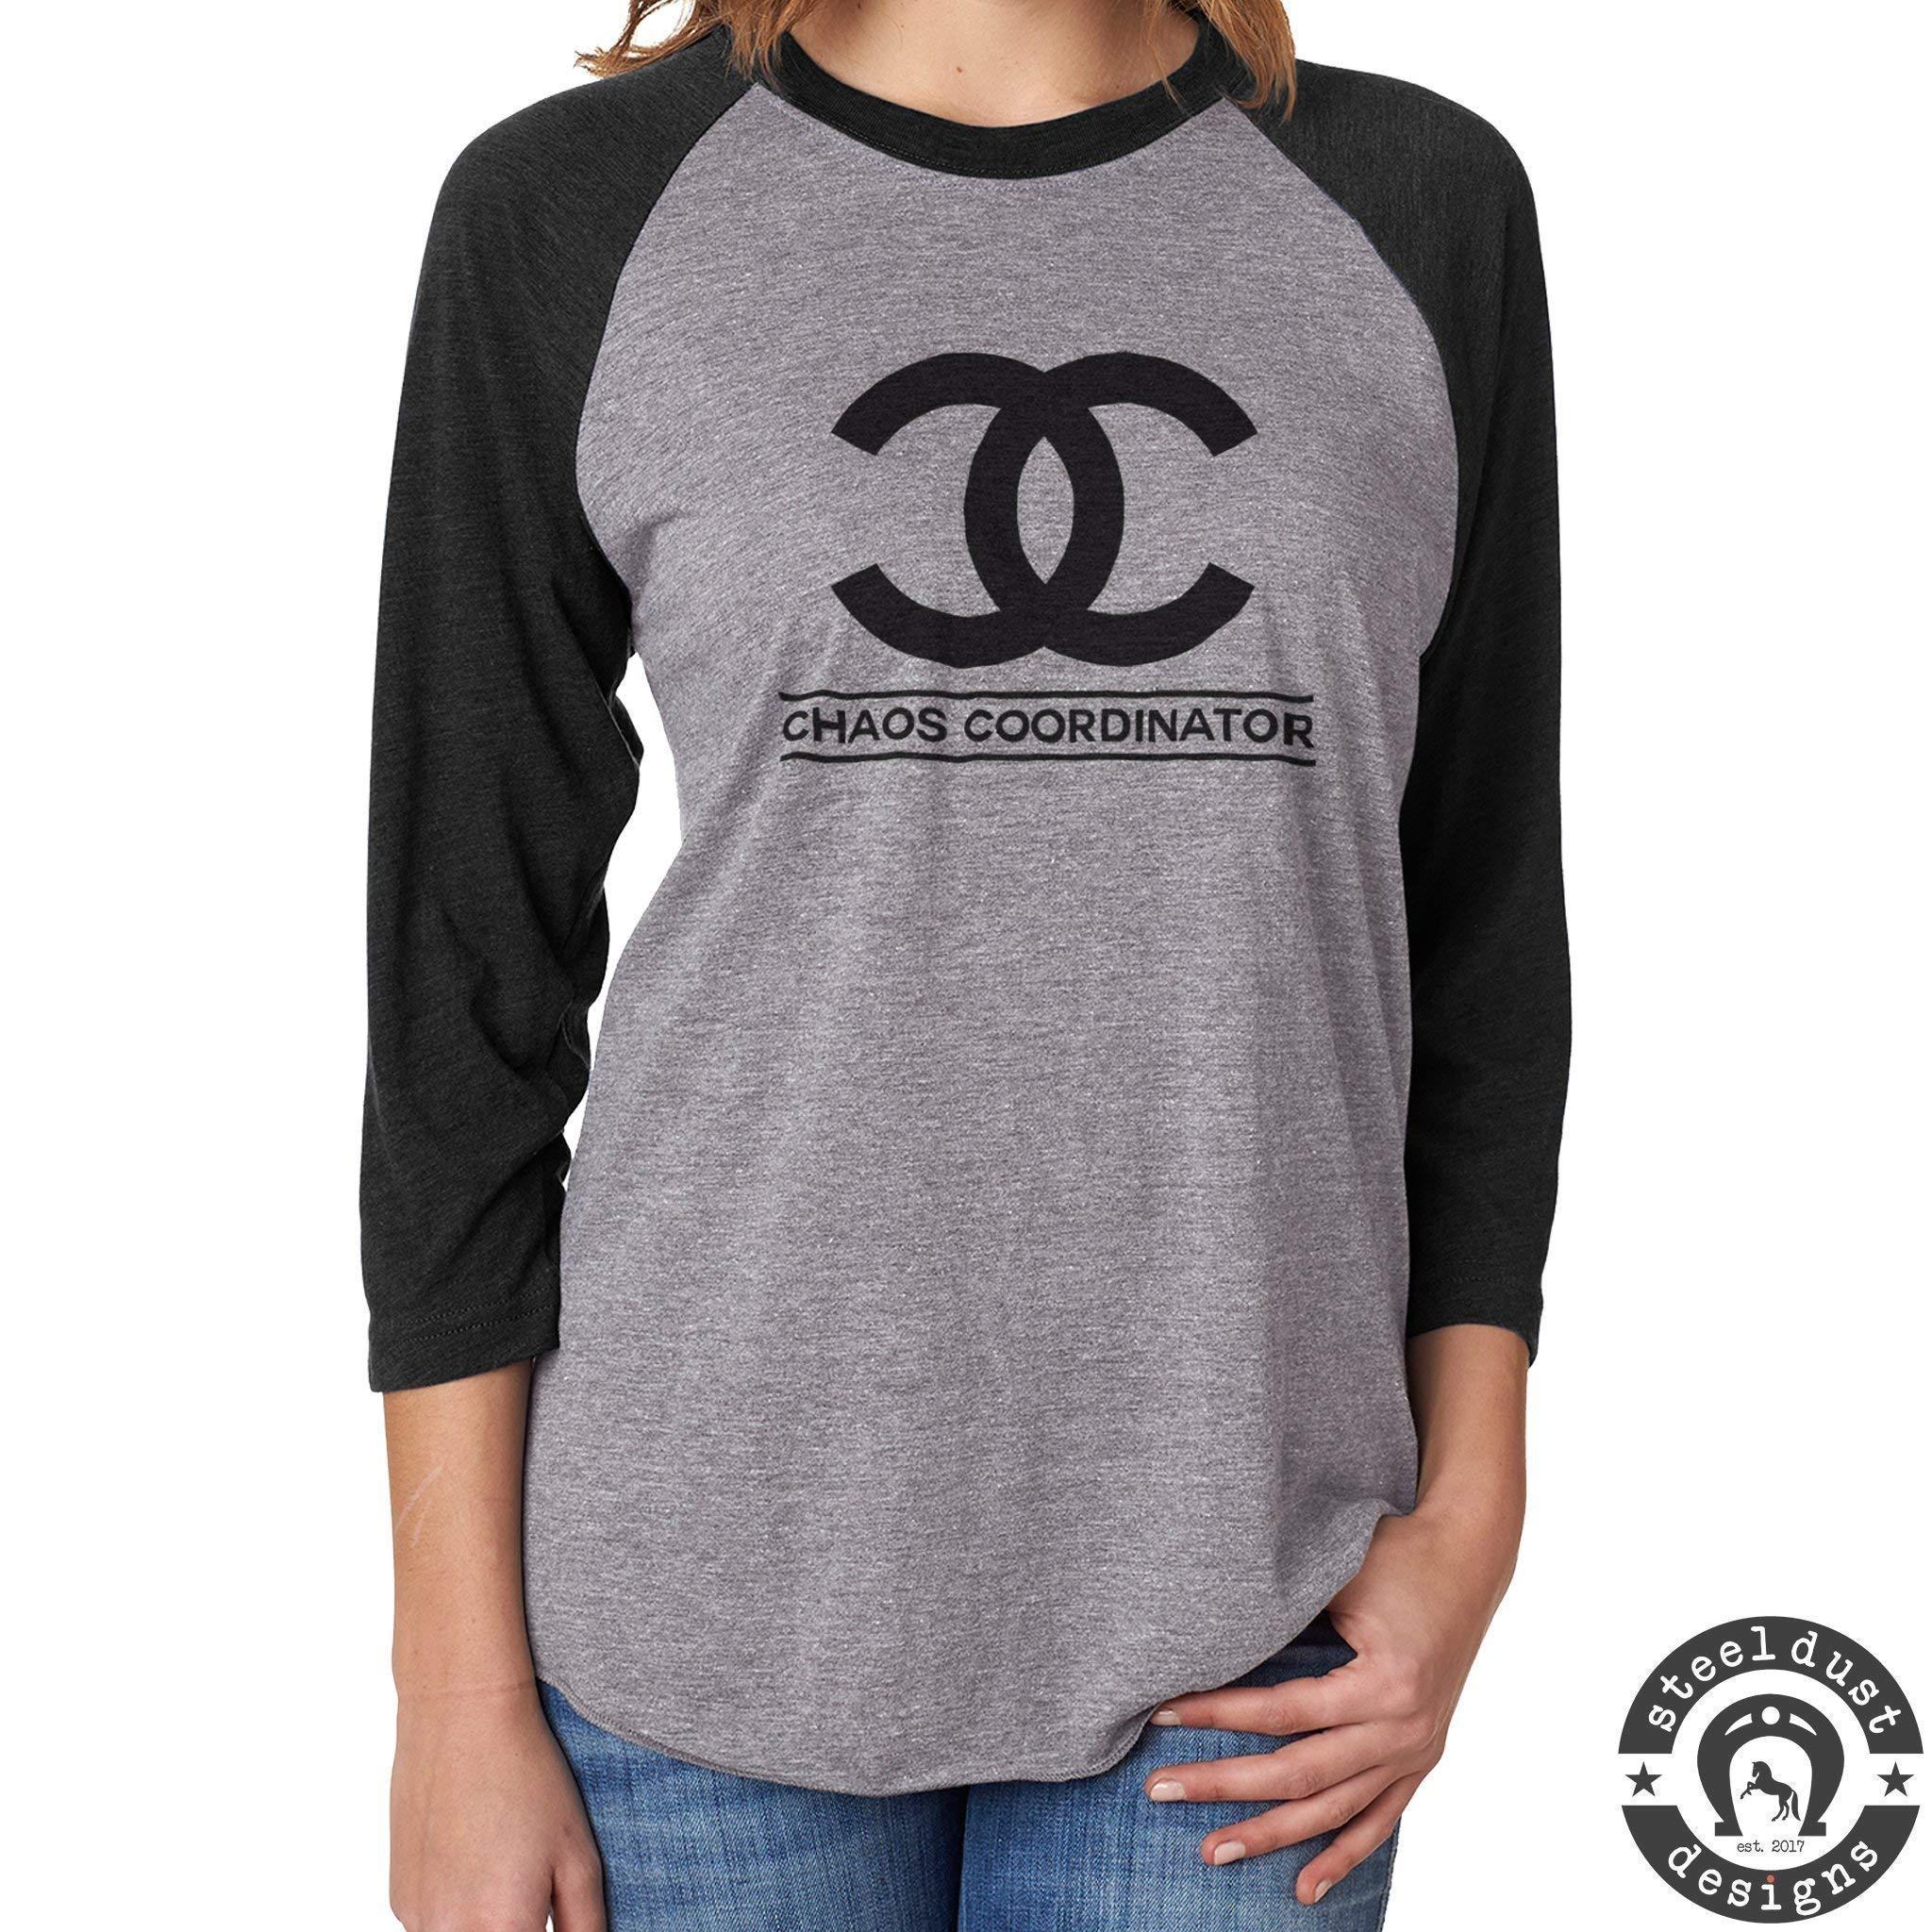 Chaos Coordinator Shirt, Womens Baseball Raglan T-Shirt, Funny Shirt for Mom Teacher